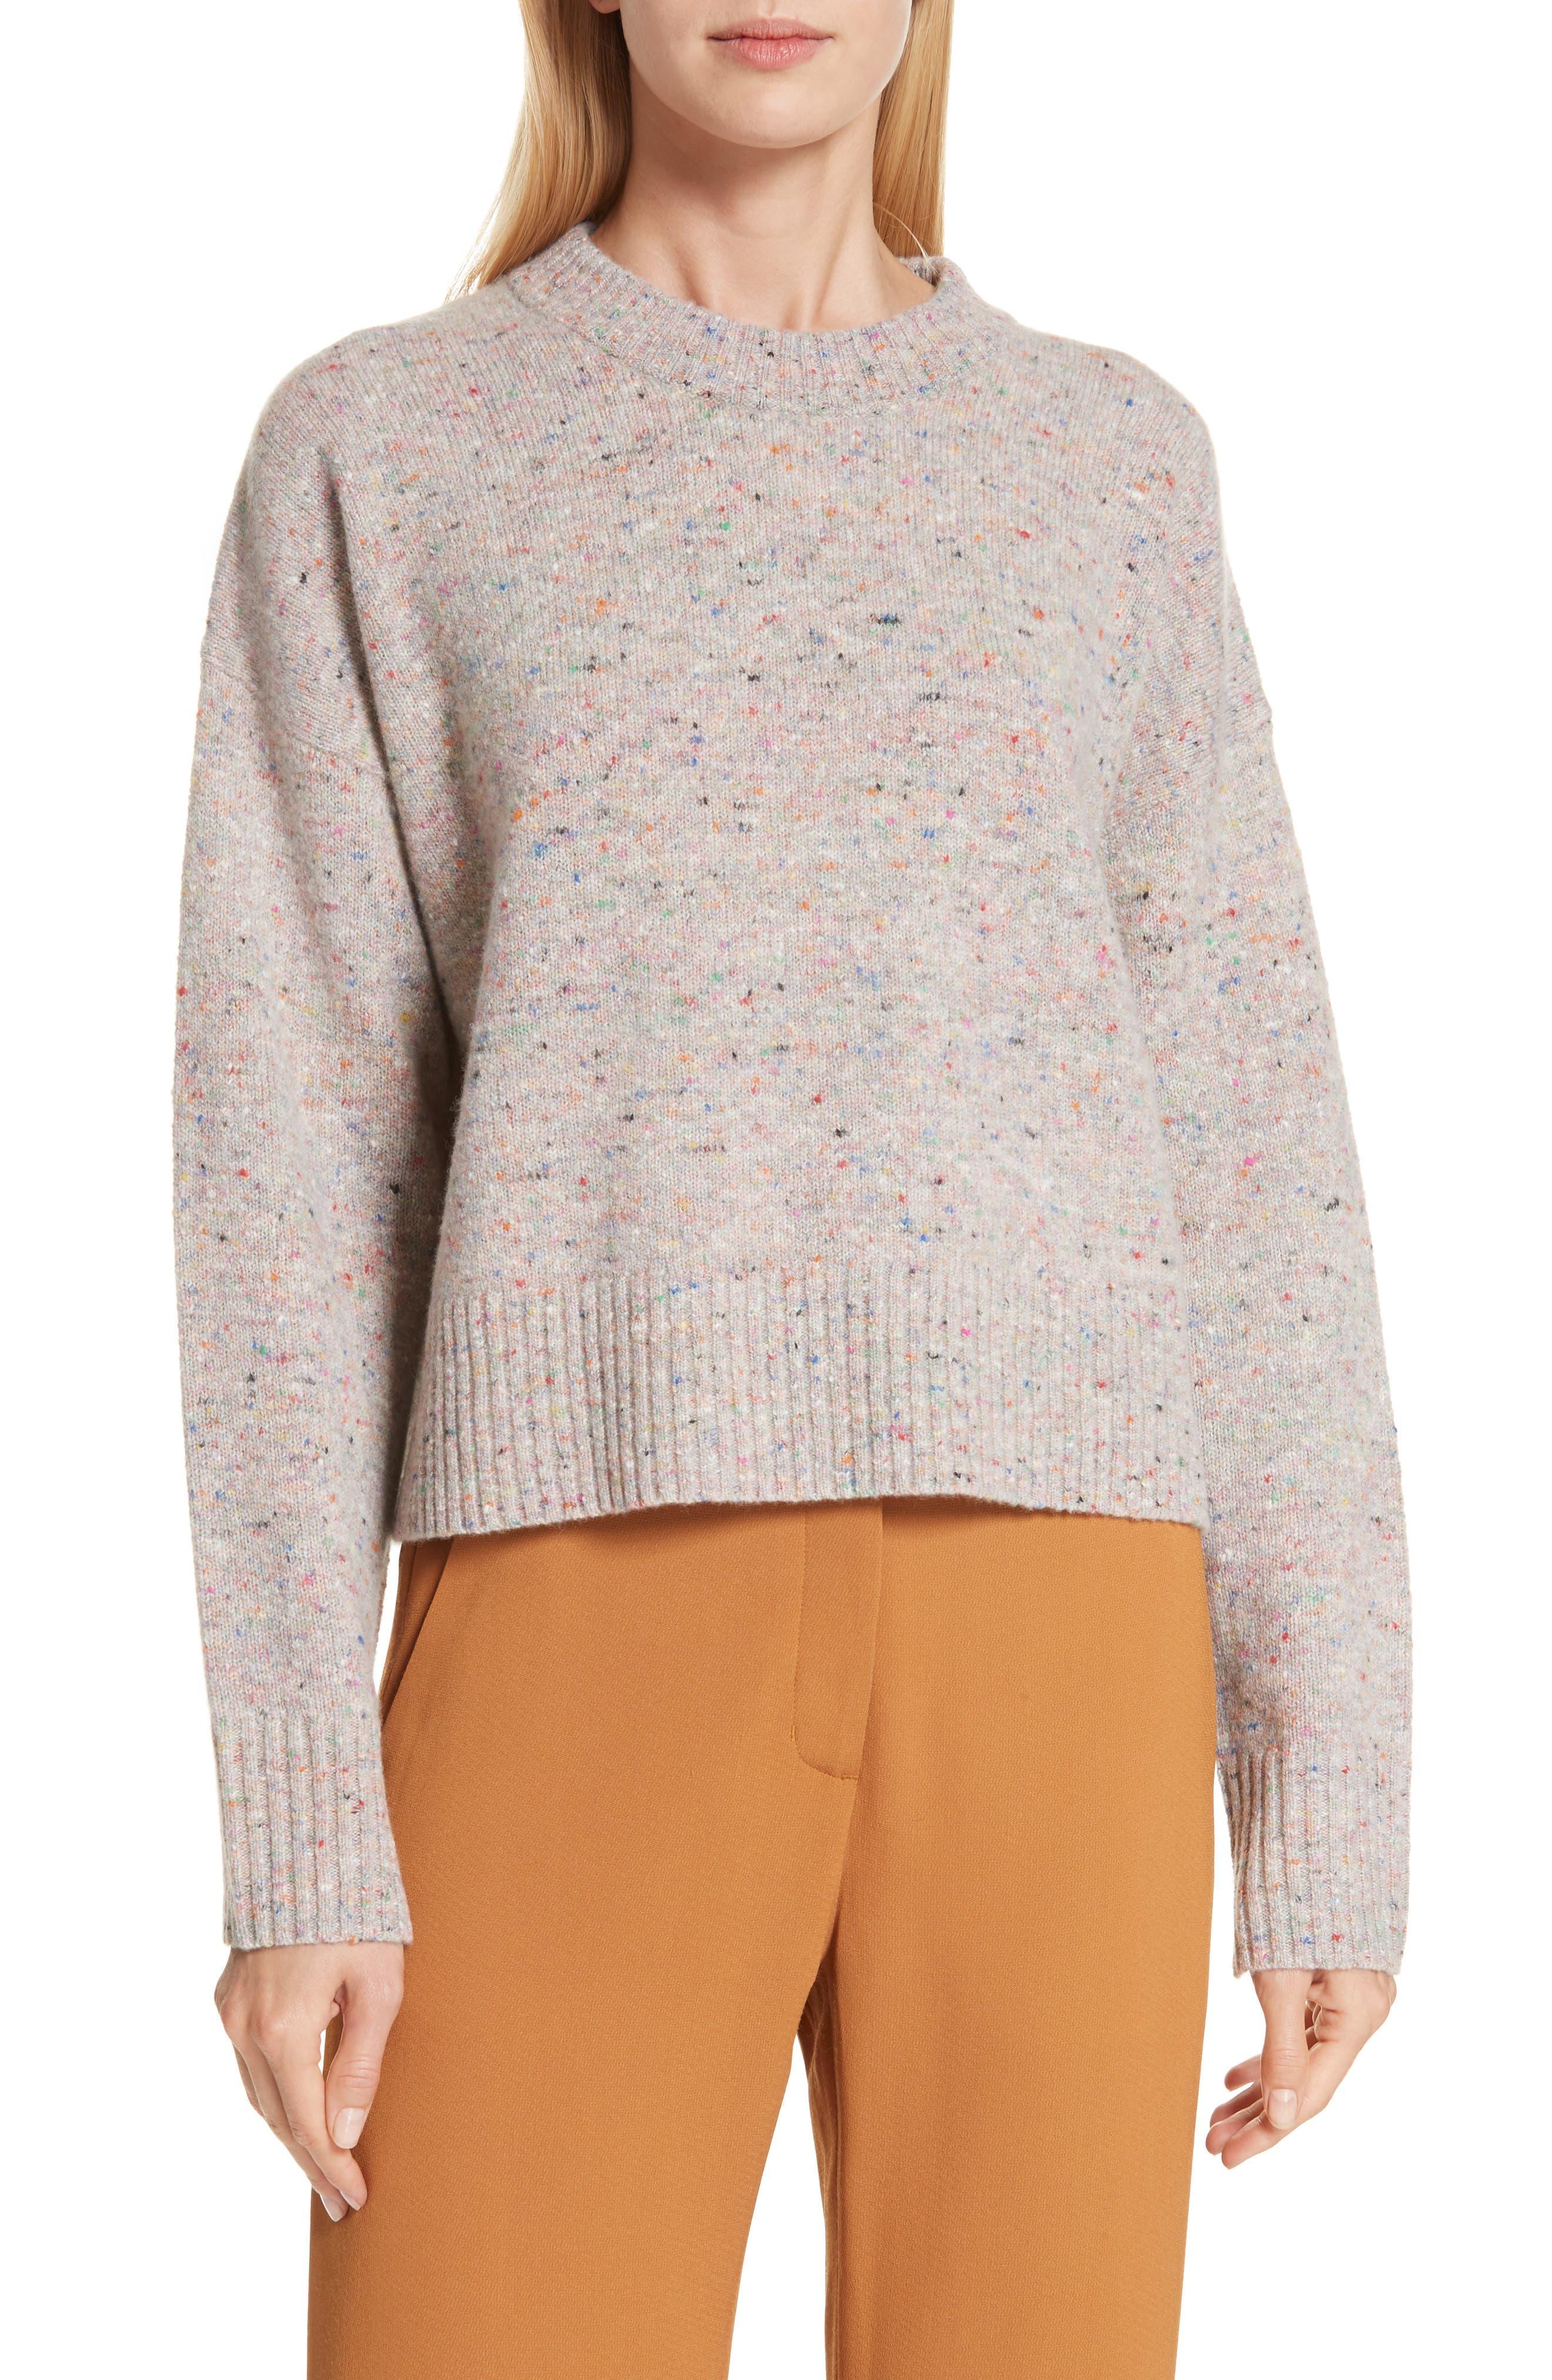 Emmeline Lambswool & Cashmere Blend Sweater, Main, color, MULTICOLOR